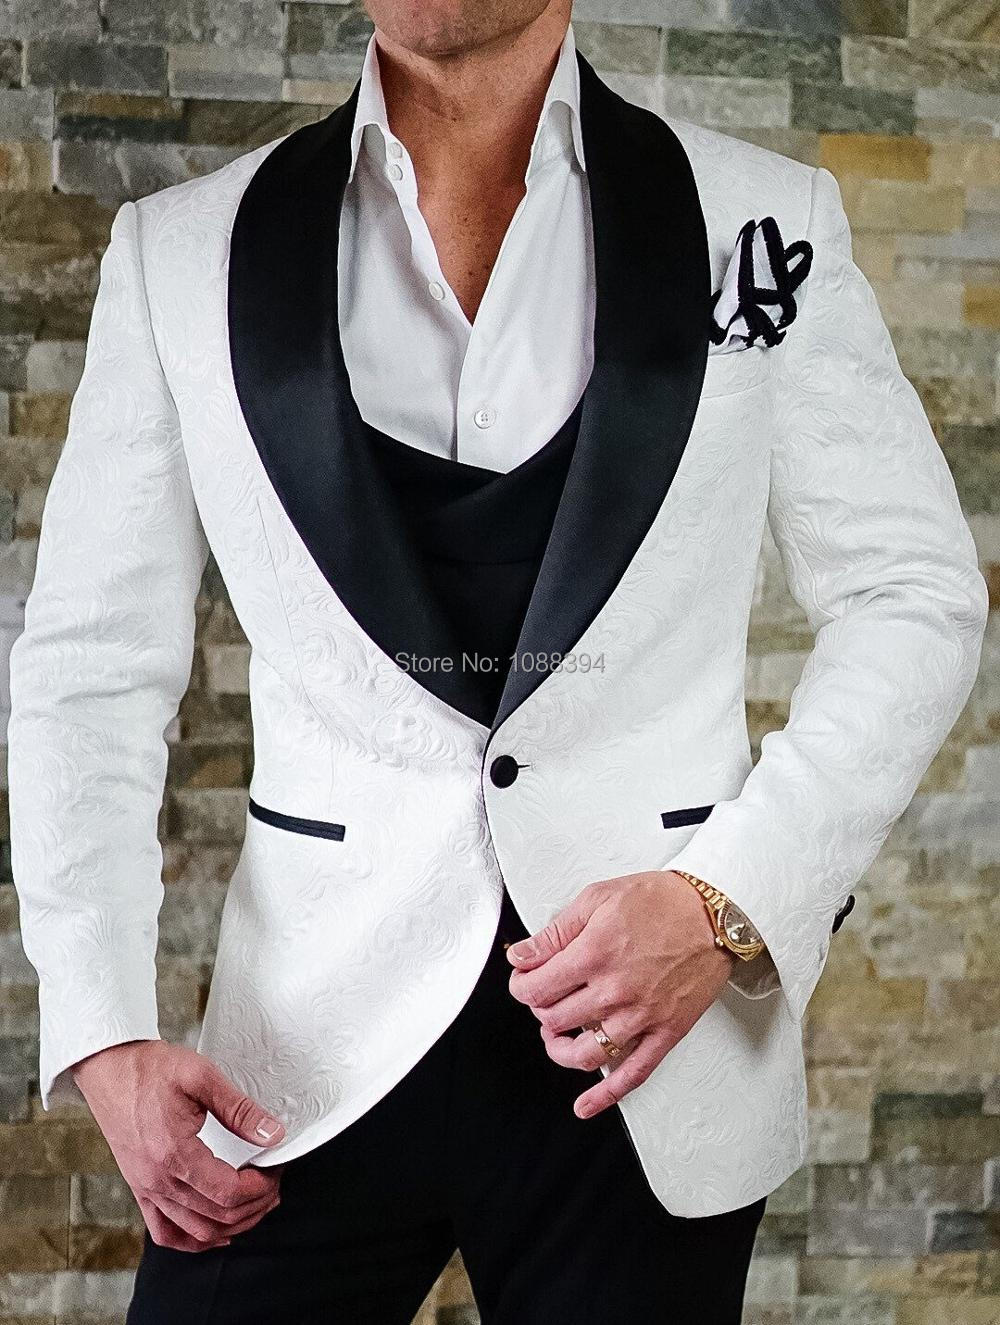 costume homme mariage 2018 best man blazer smoking white. Black Bedroom Furniture Sets. Home Design Ideas